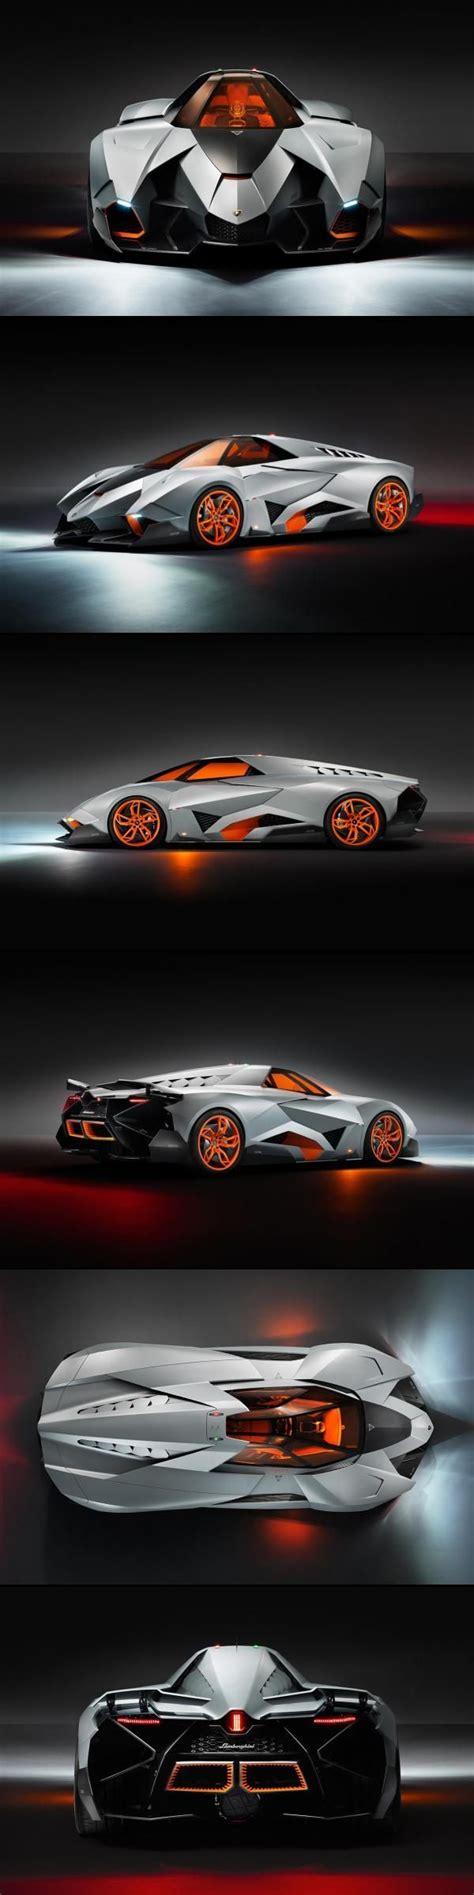 Top Speed Of Lamborghini Egoista 1000 Ideas About Find Cars On Kia Sorento